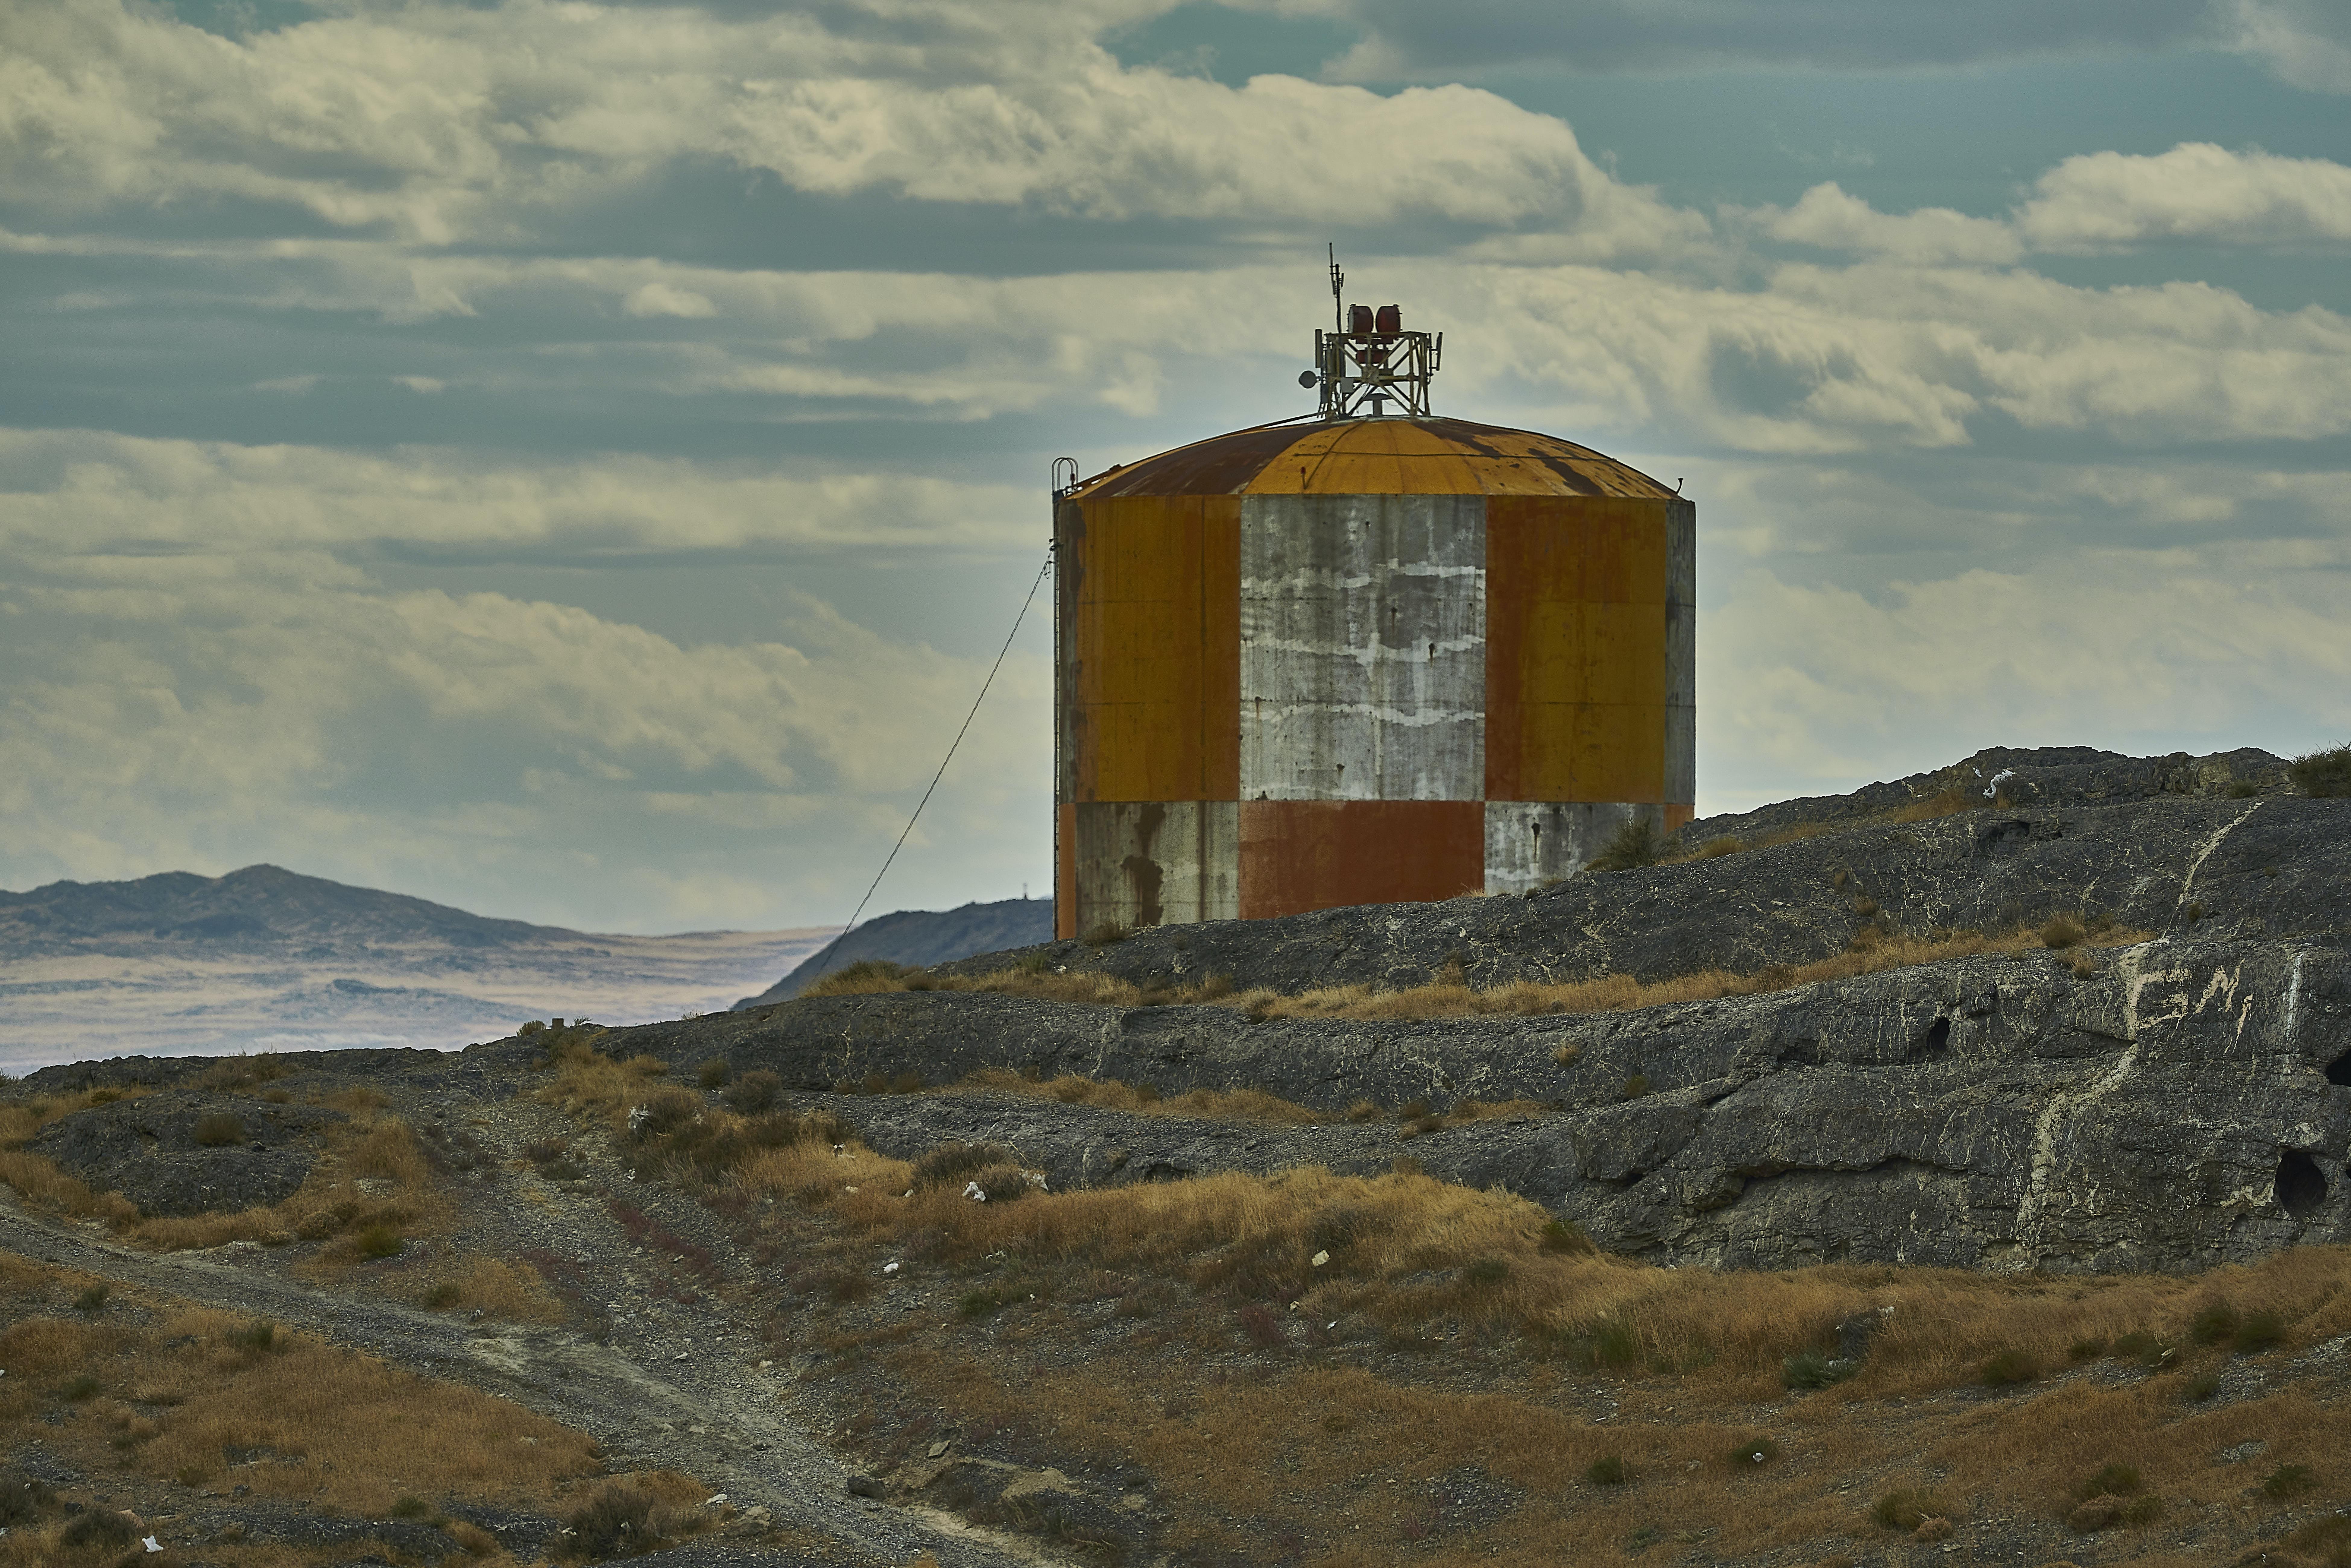 brown and gray tank near mountain